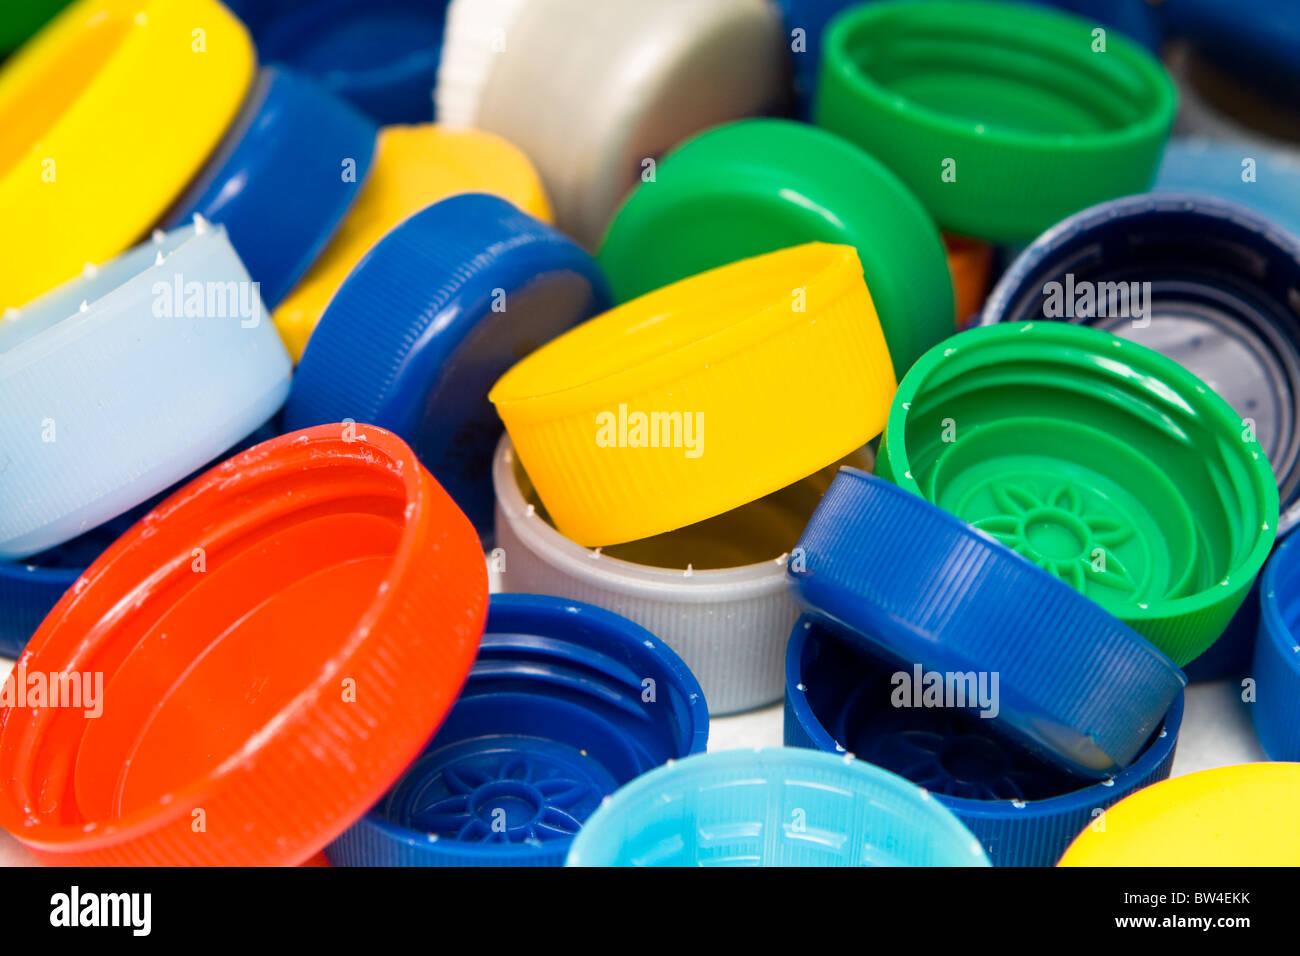 Lots of colorful plastic caps. Shot in studio. - Stock Image